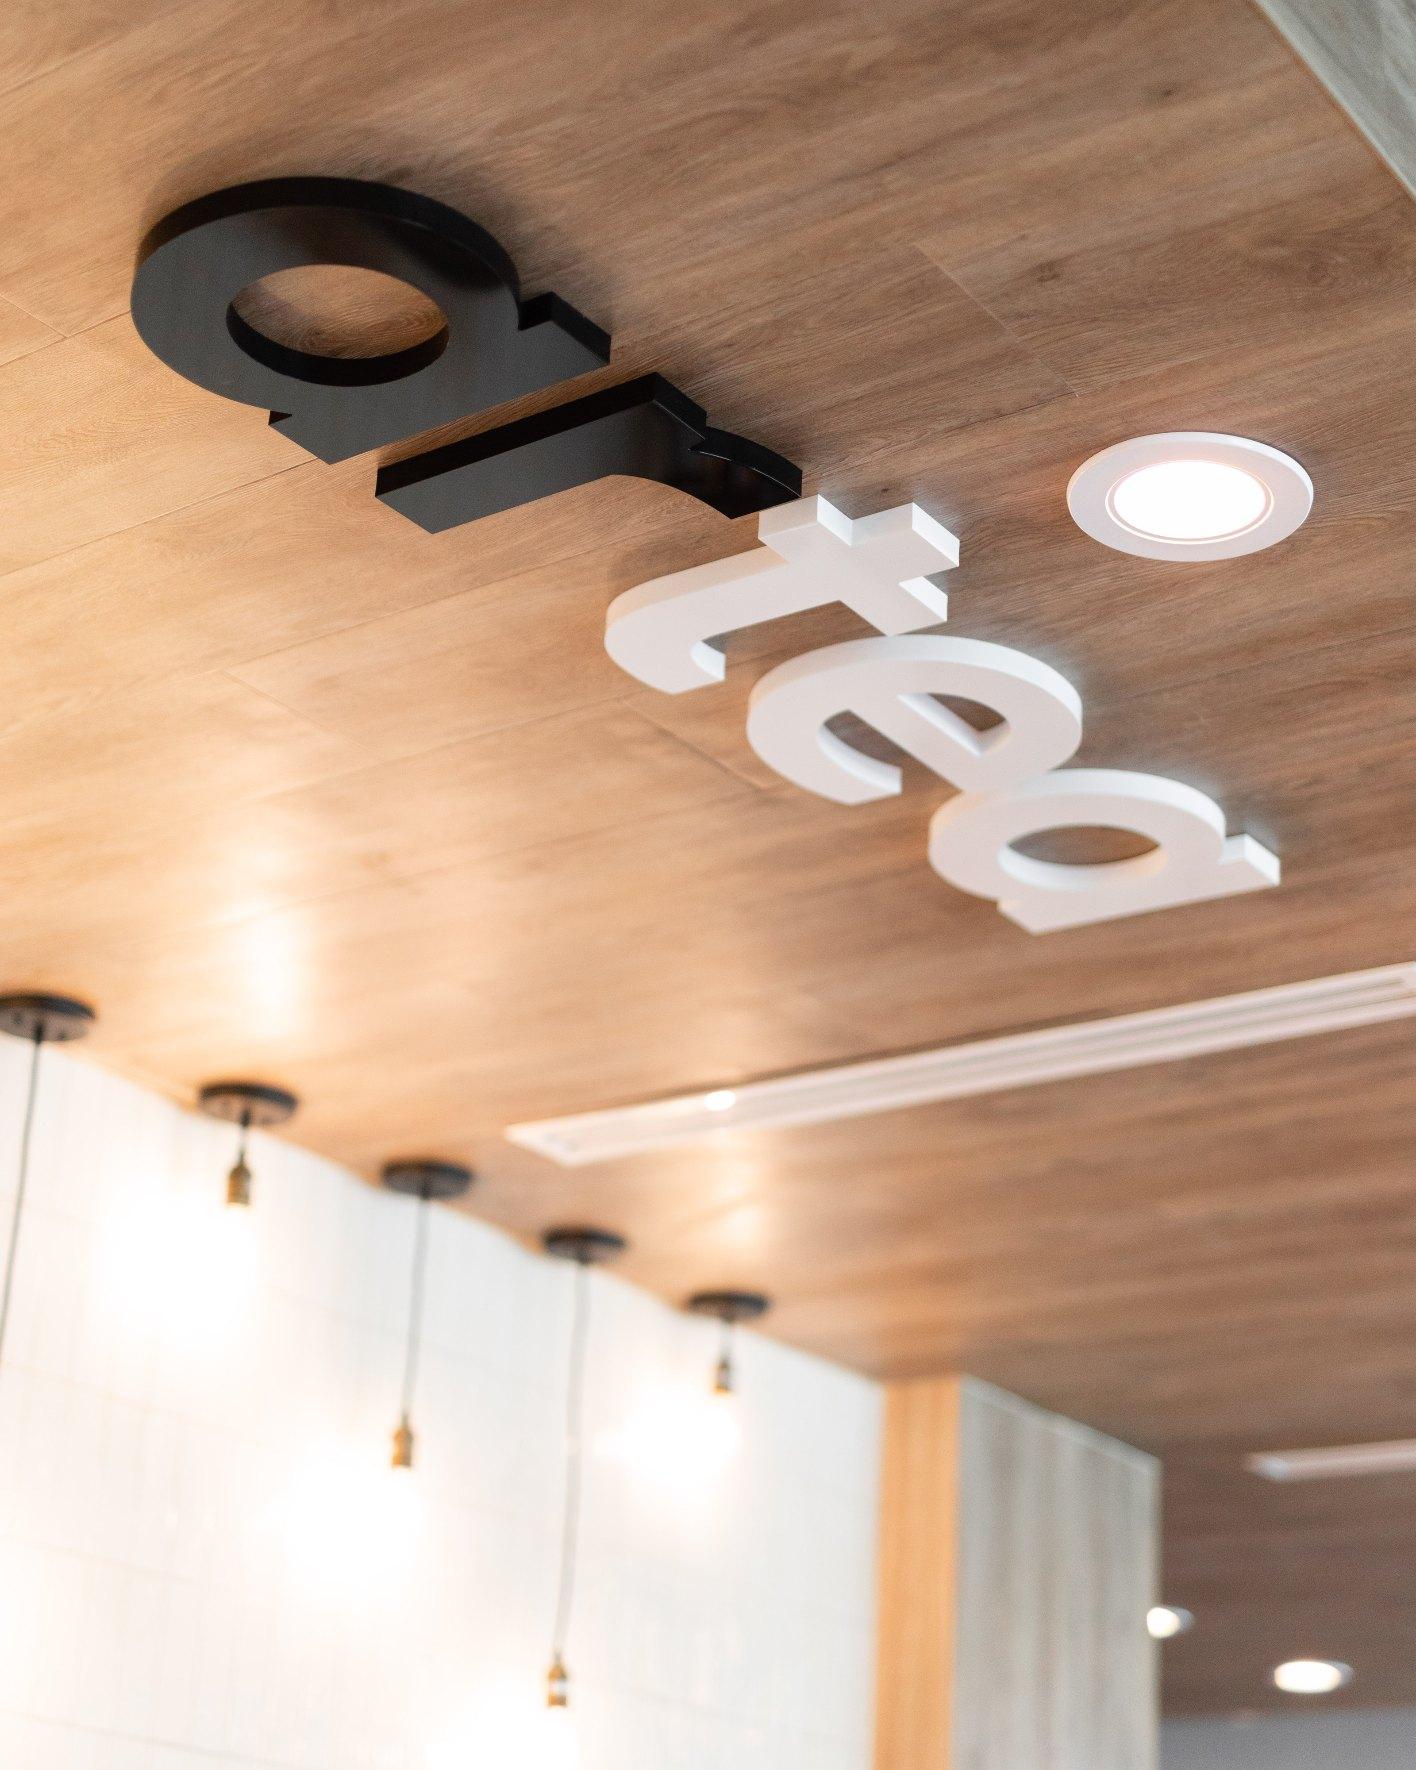 Artea Logo in Ceiling